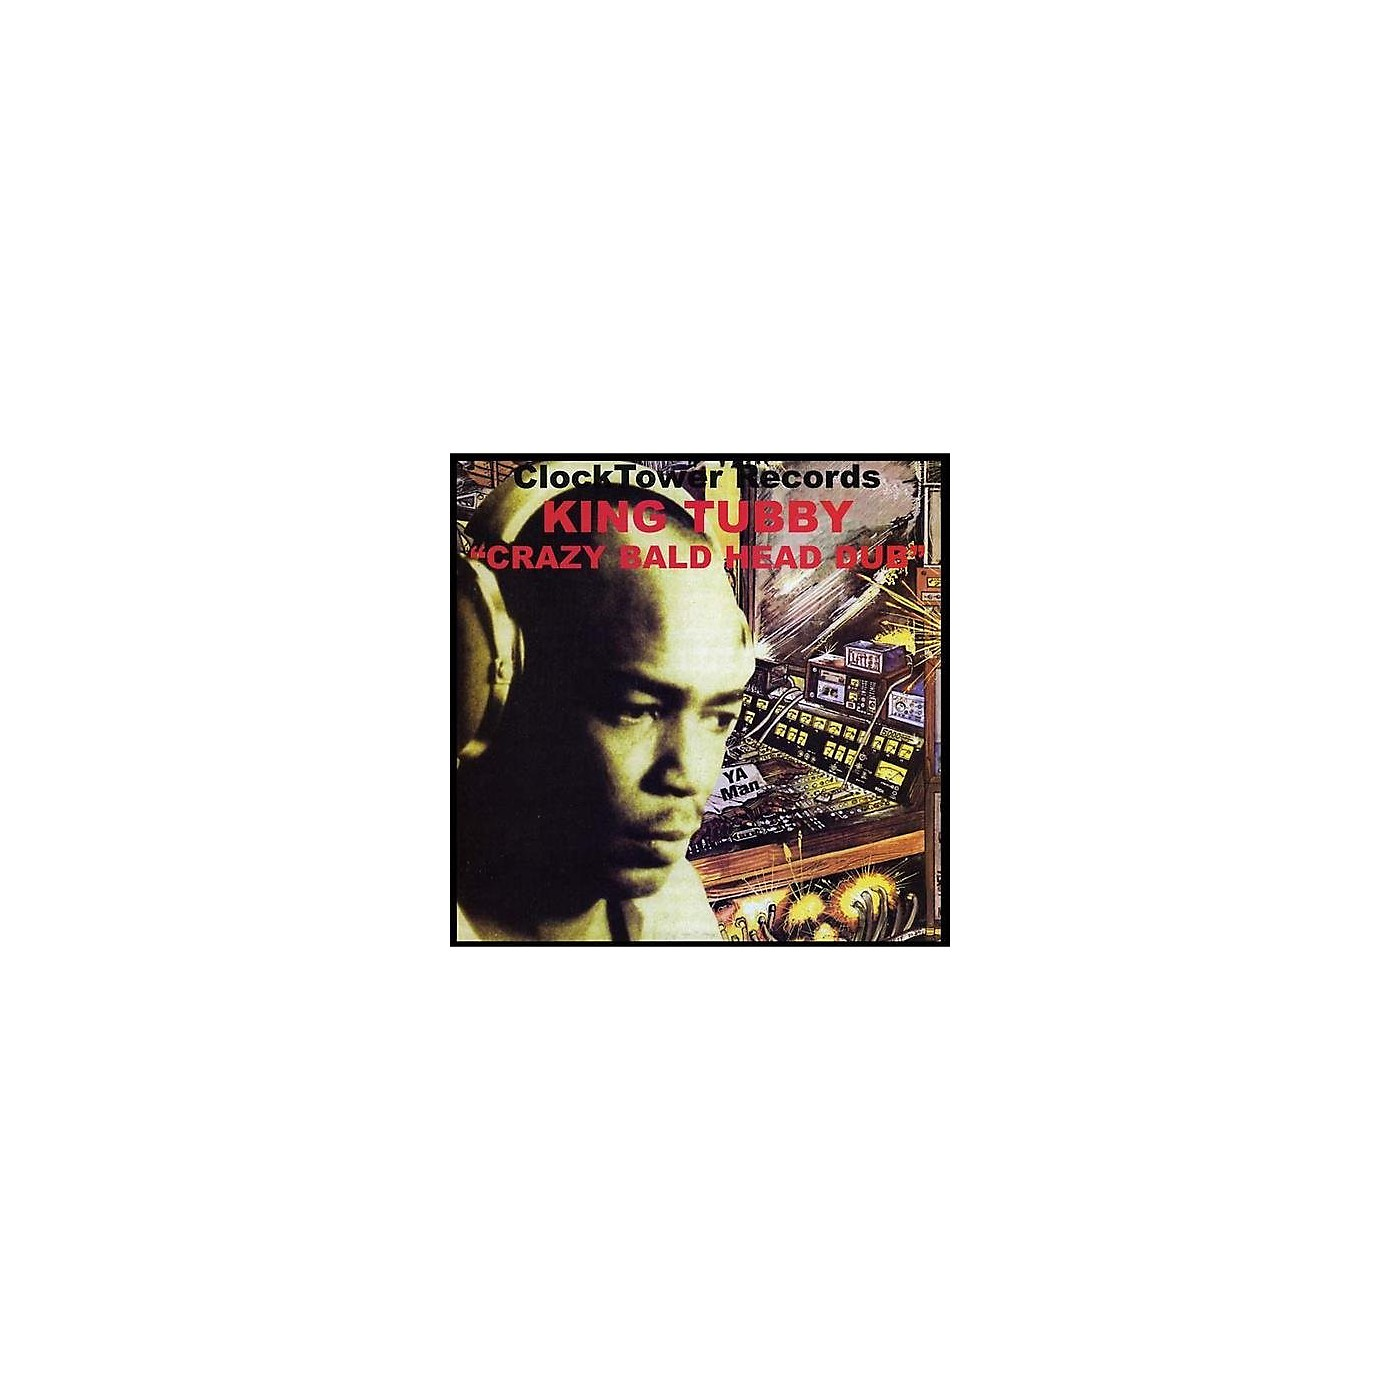 Alliance King Tubby - Crazy Bald Head Dub thumbnail